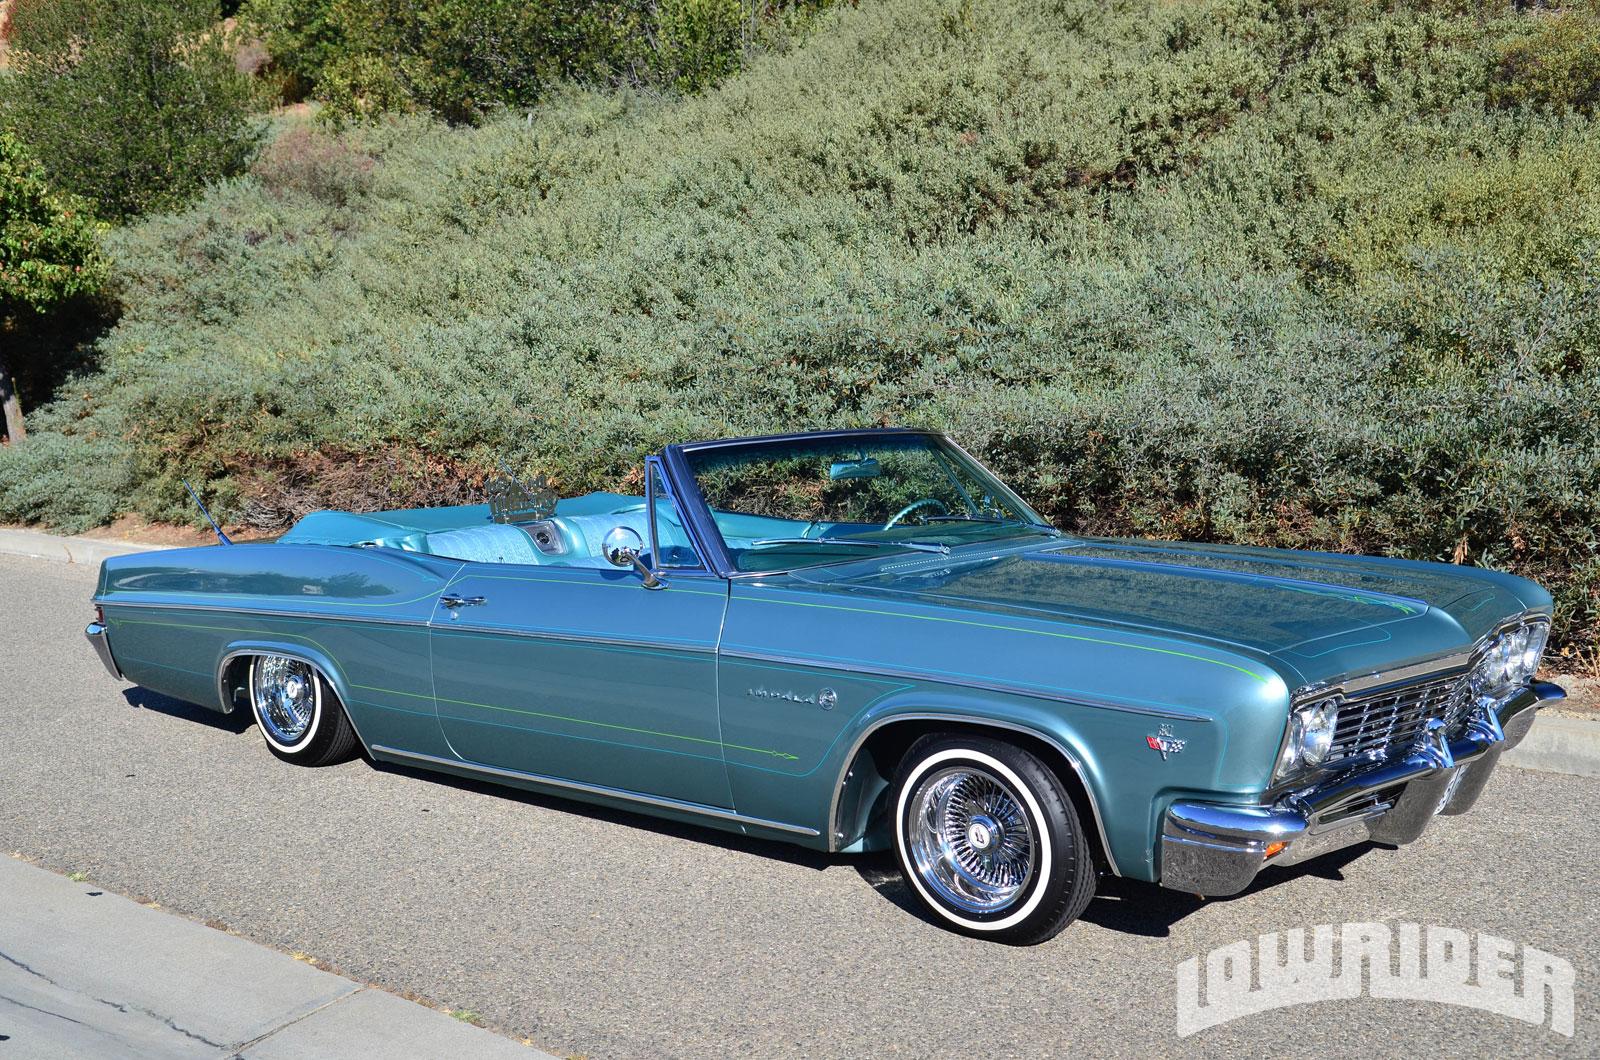 Impala 1966 chevrolet impala : 1966 Chevrolet Impala - Lowrider Magazine